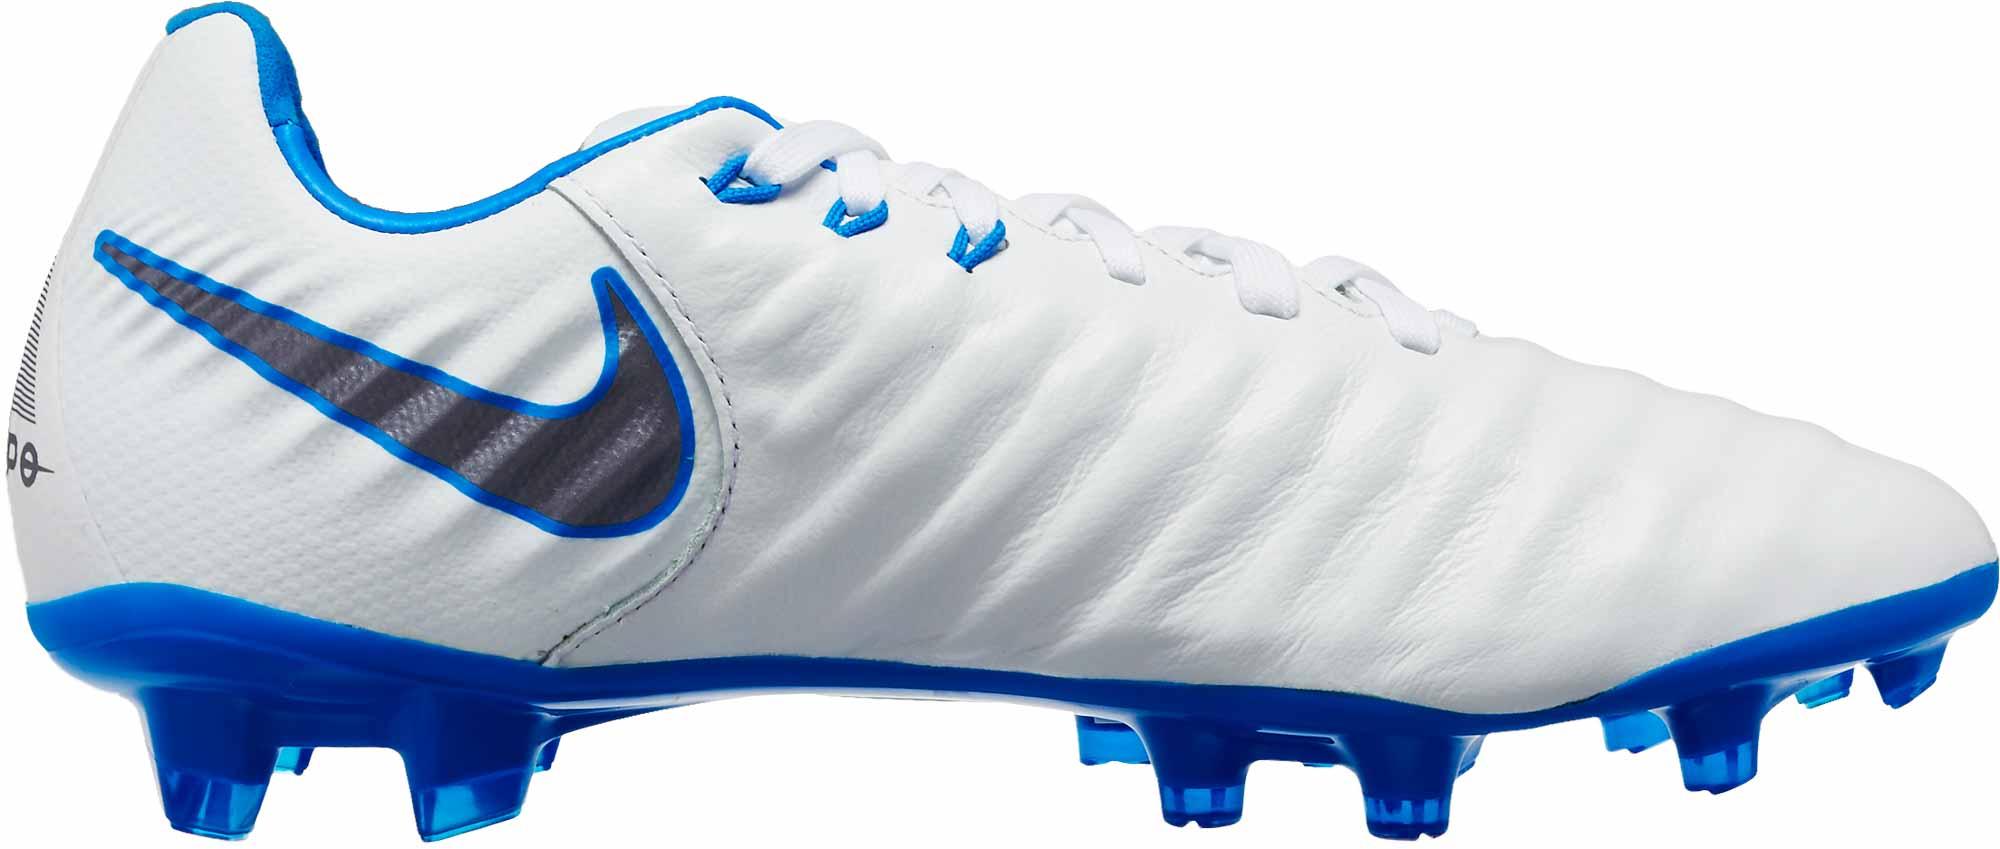 7dc04076b388 Home / Shop By Brand / Nike Soccer / Nike Soccer Shoes / Nike Tiempo Legend  VII